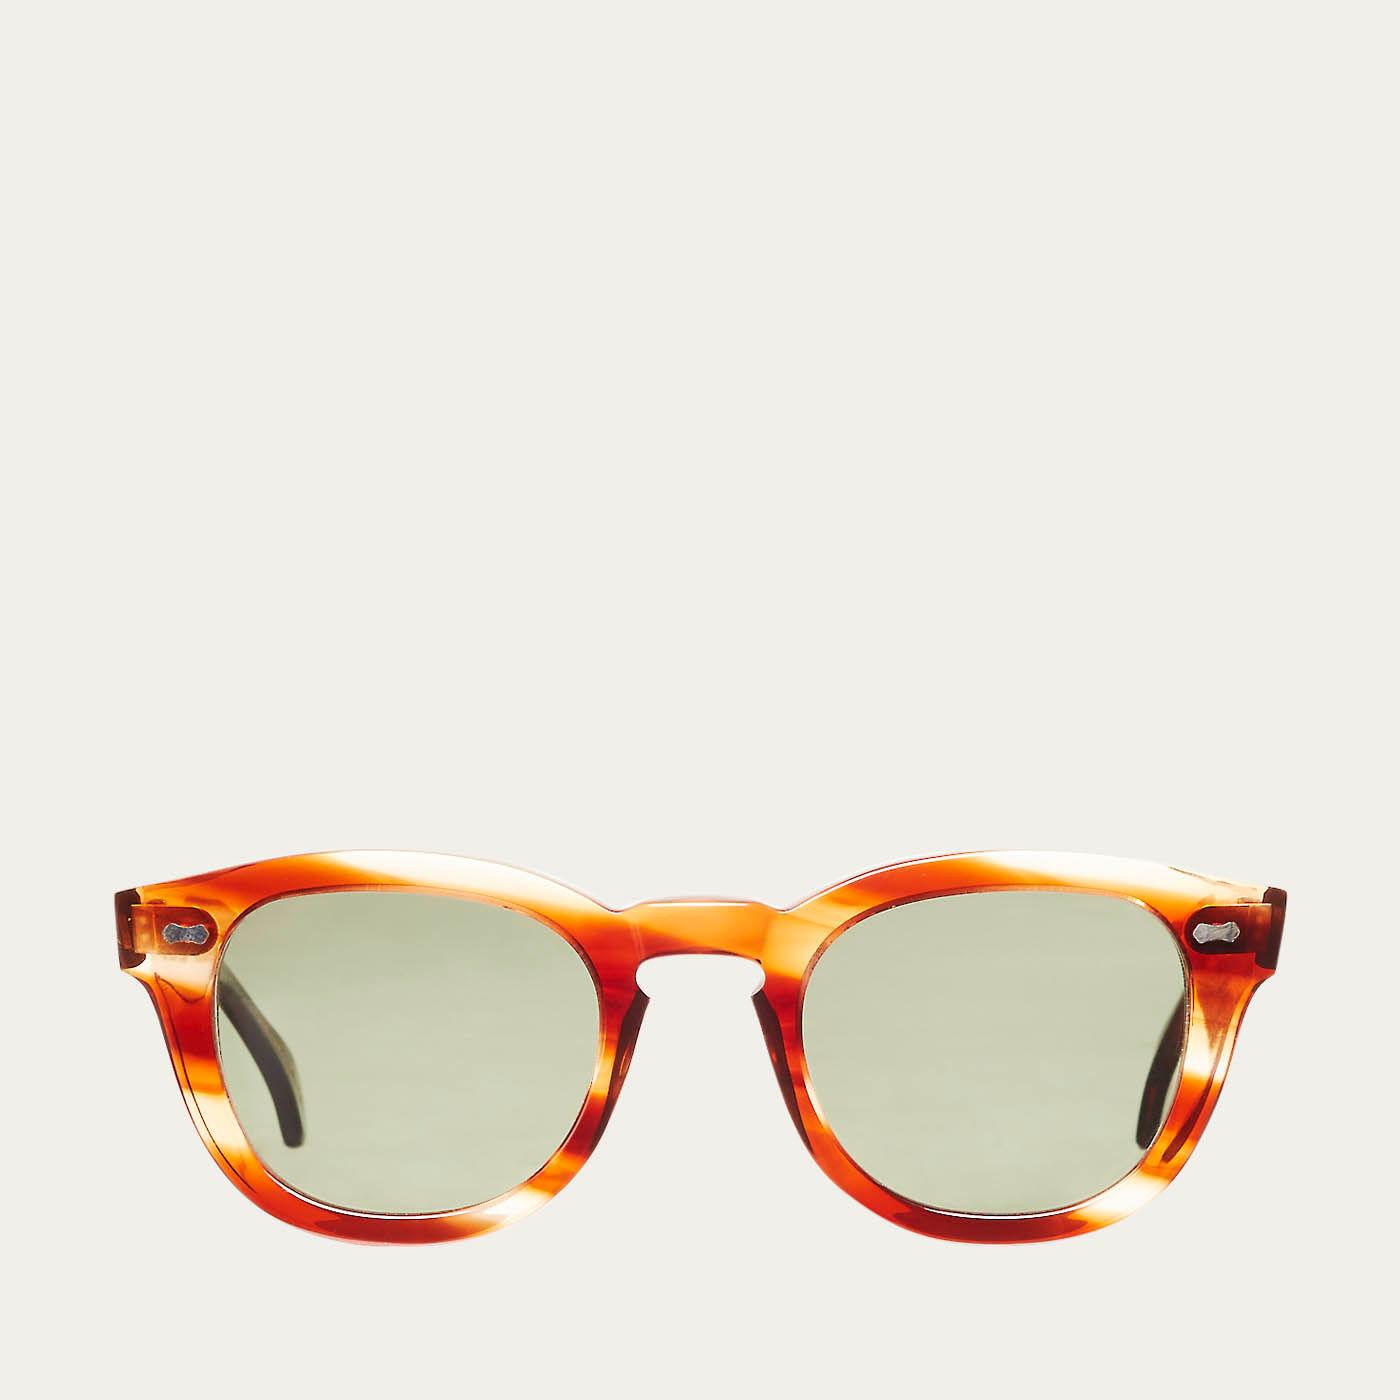 5a38f691319 Havana   Bottle Green Donegal Sunglasses